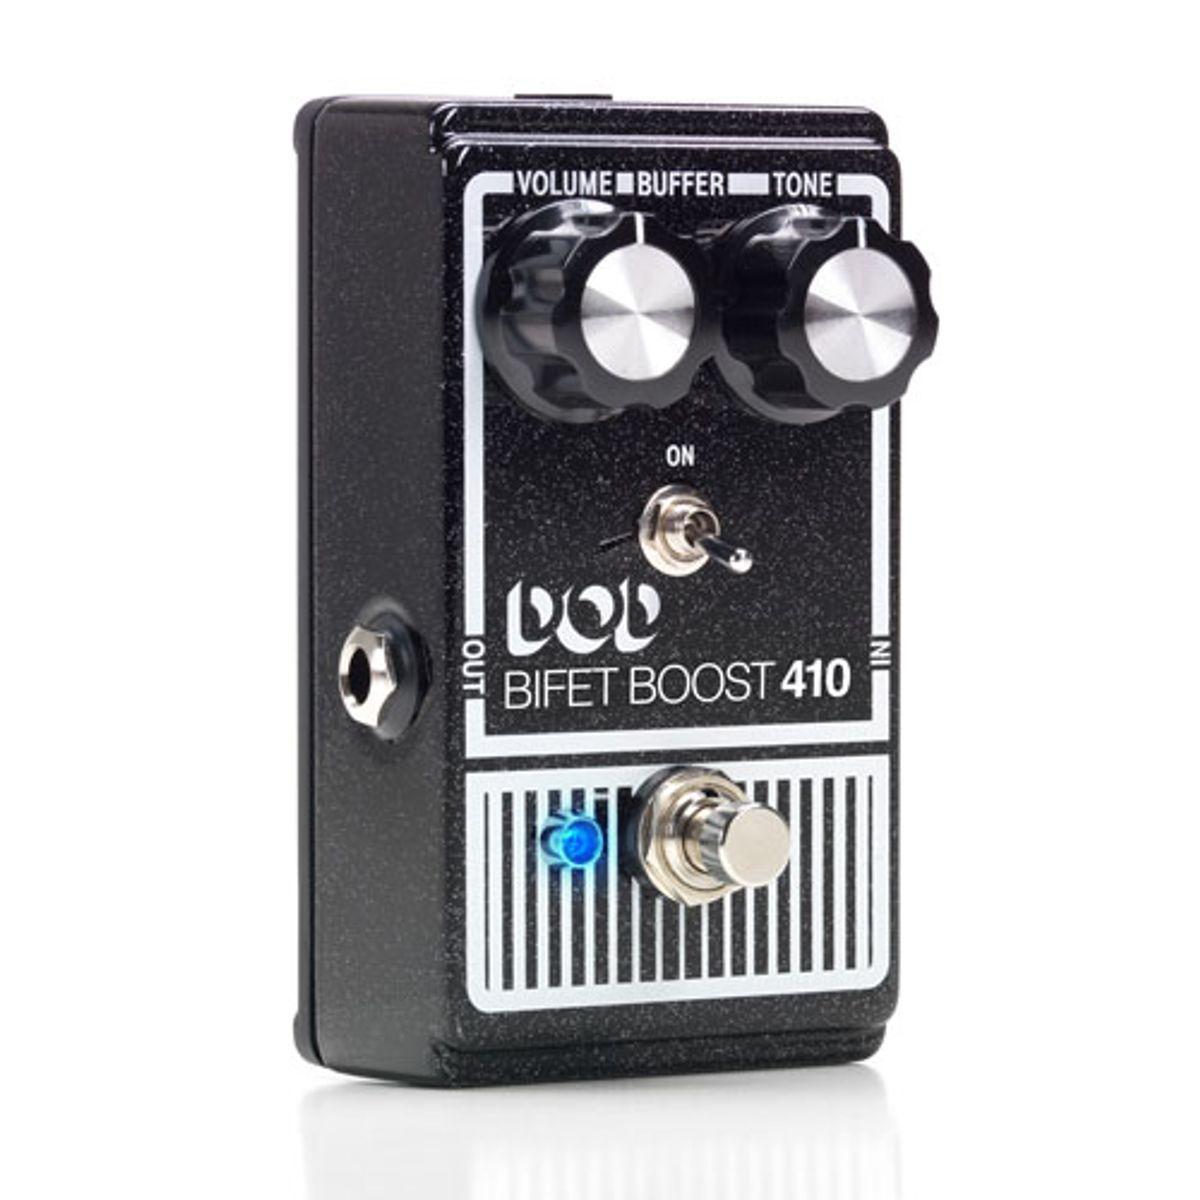 DOD Reissues the Bifet Boost 410